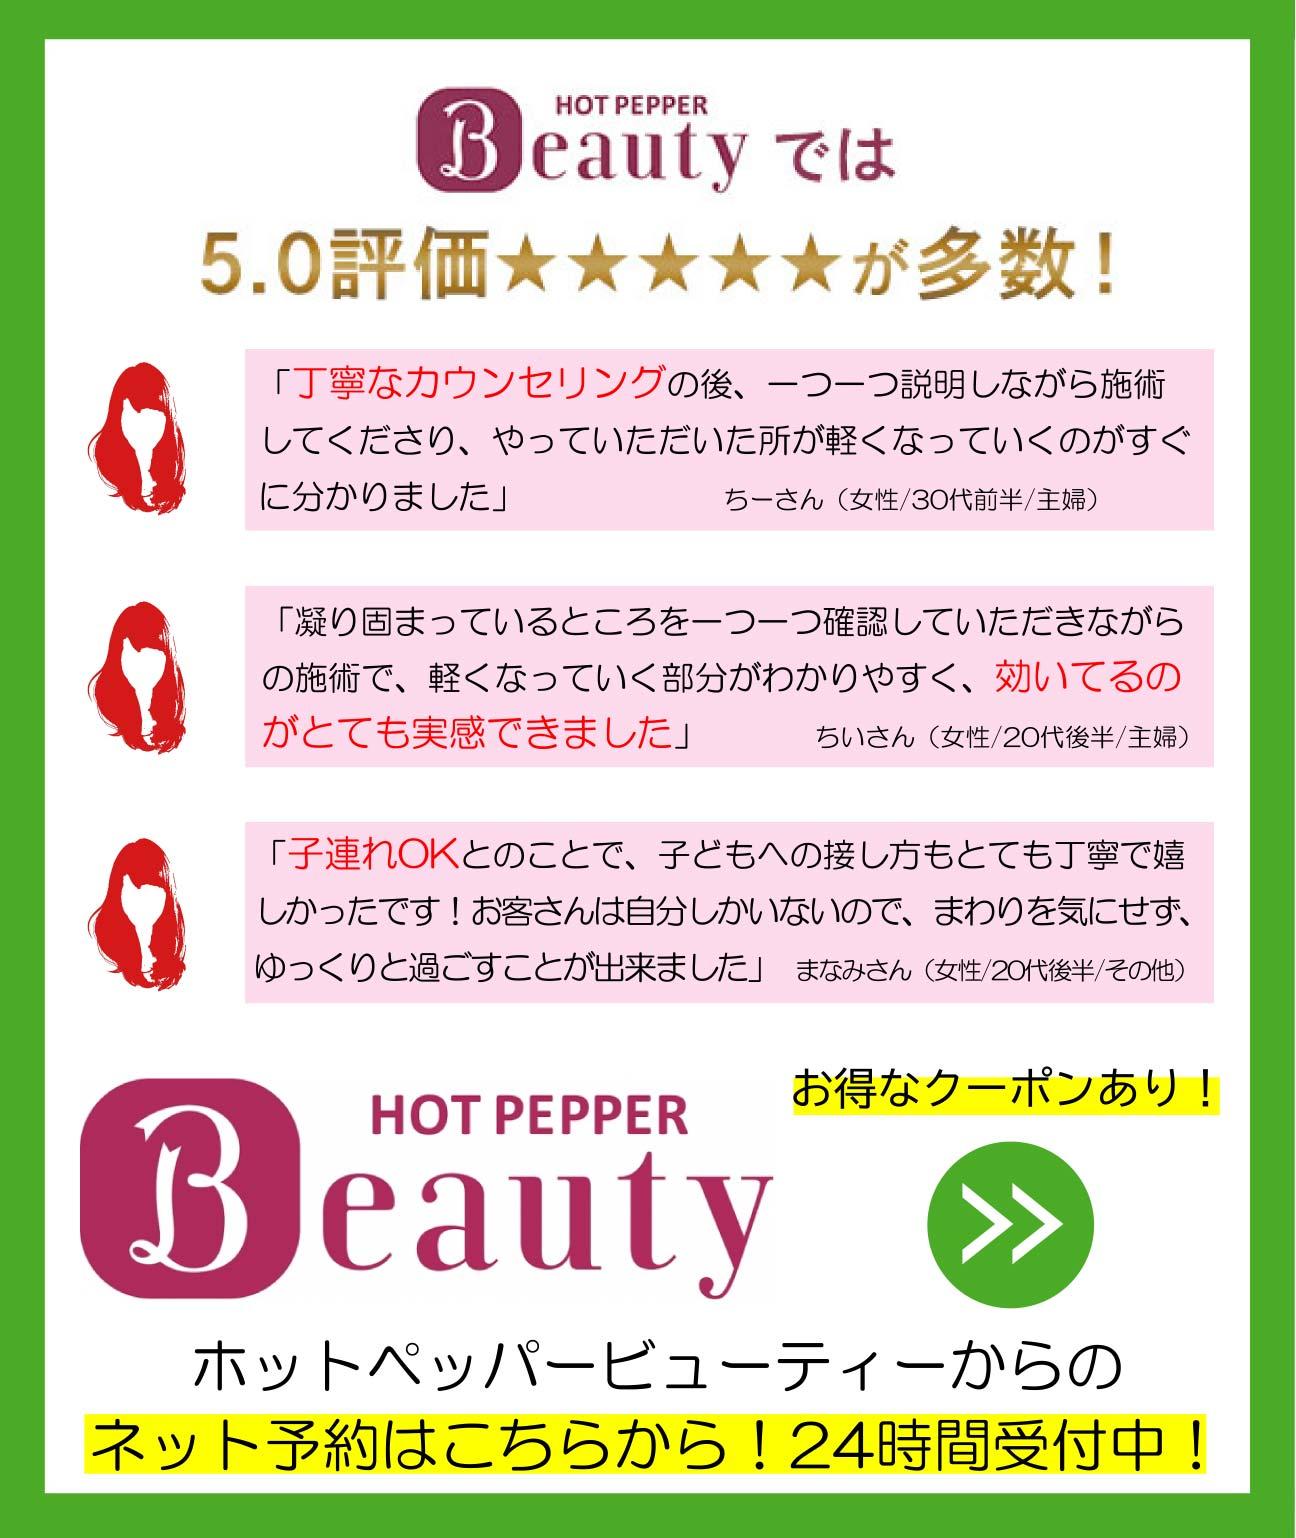 hotpepper-kutikomi-yoyaku-green.jpg